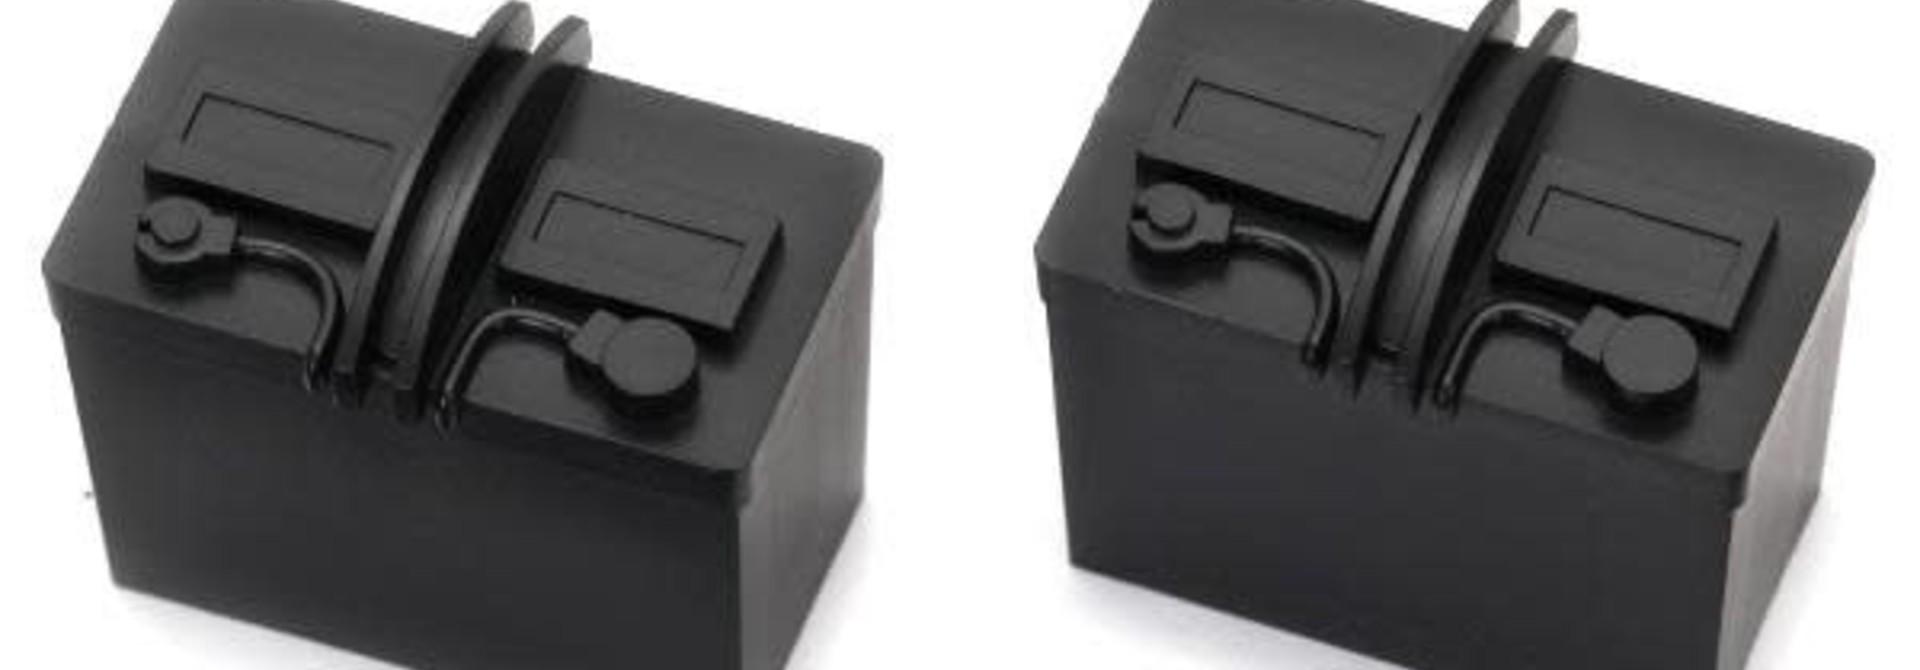 Batteries, black (2)